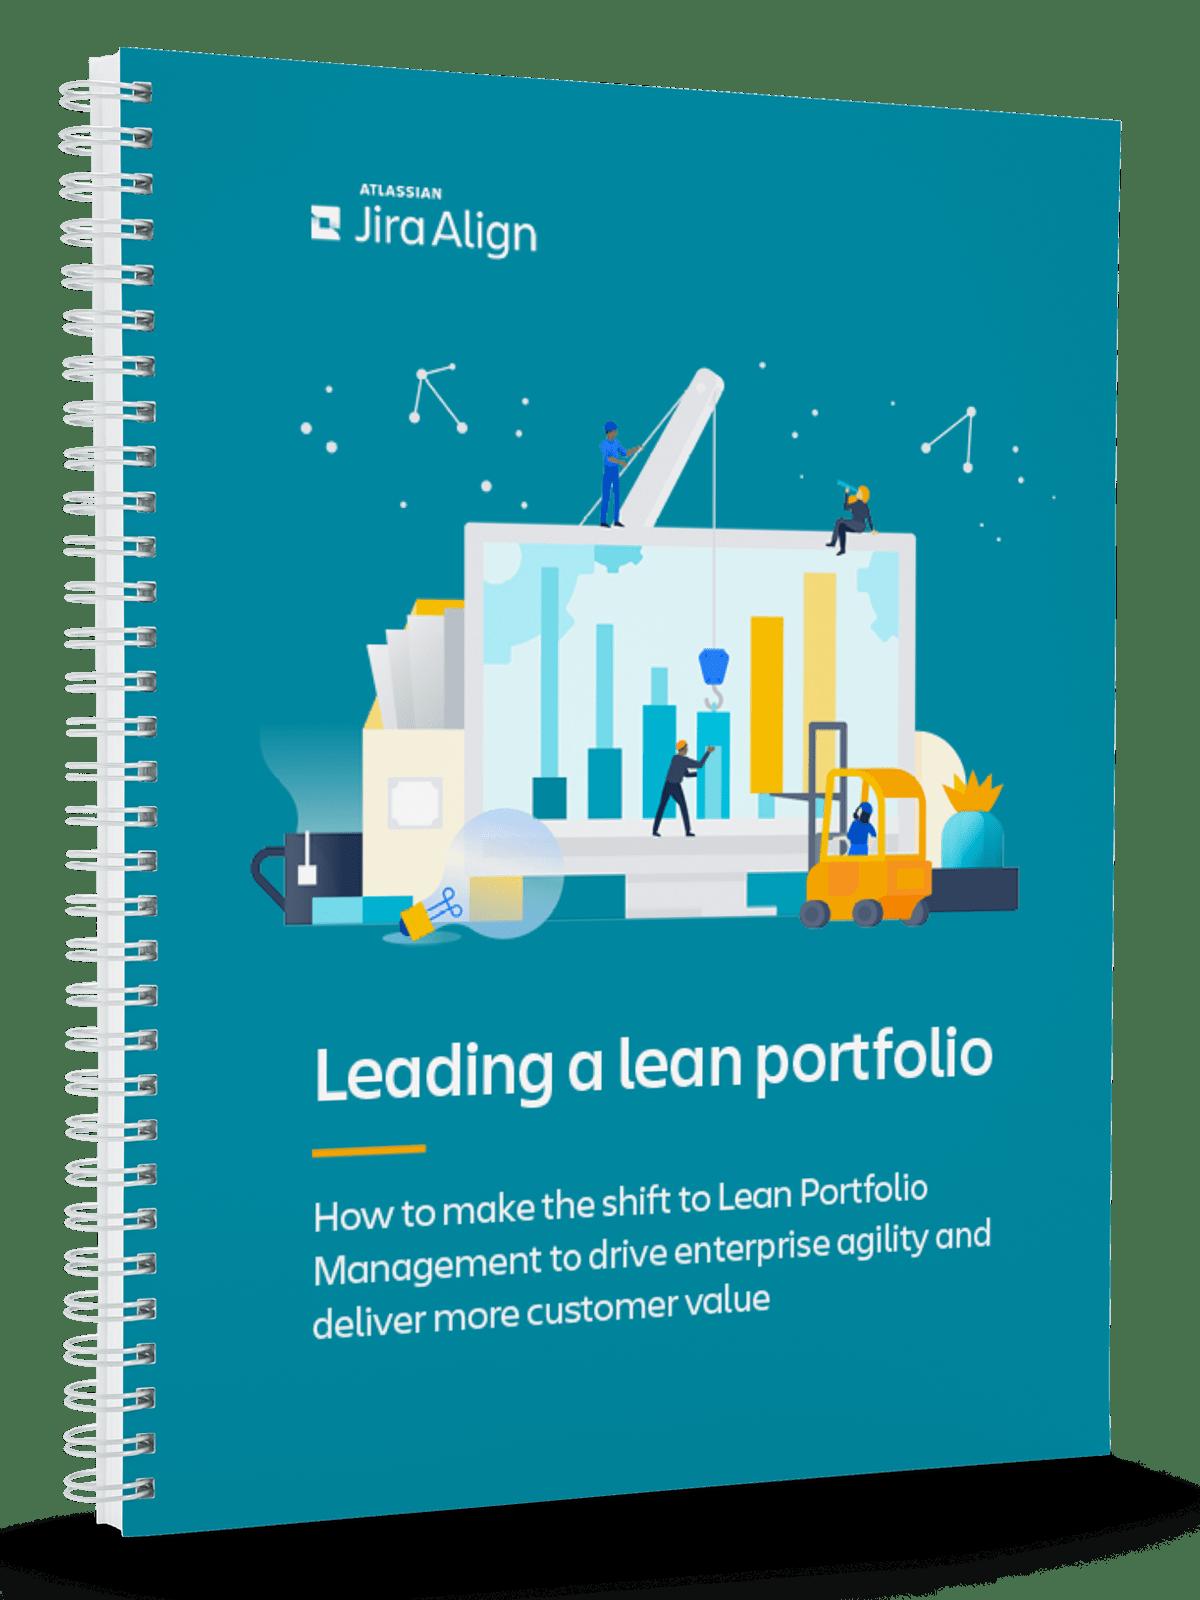 Leading a lean portfolio ebook Cover